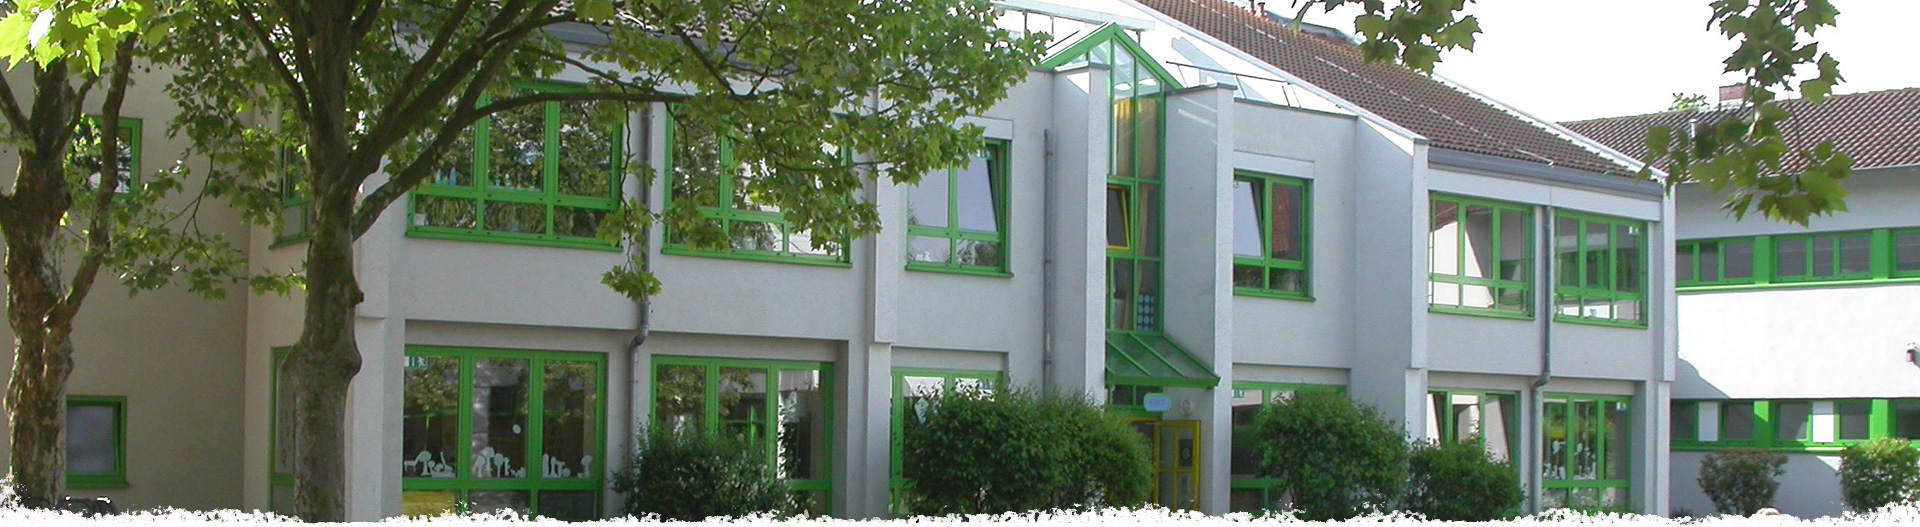 Lichtblick Lindenschule